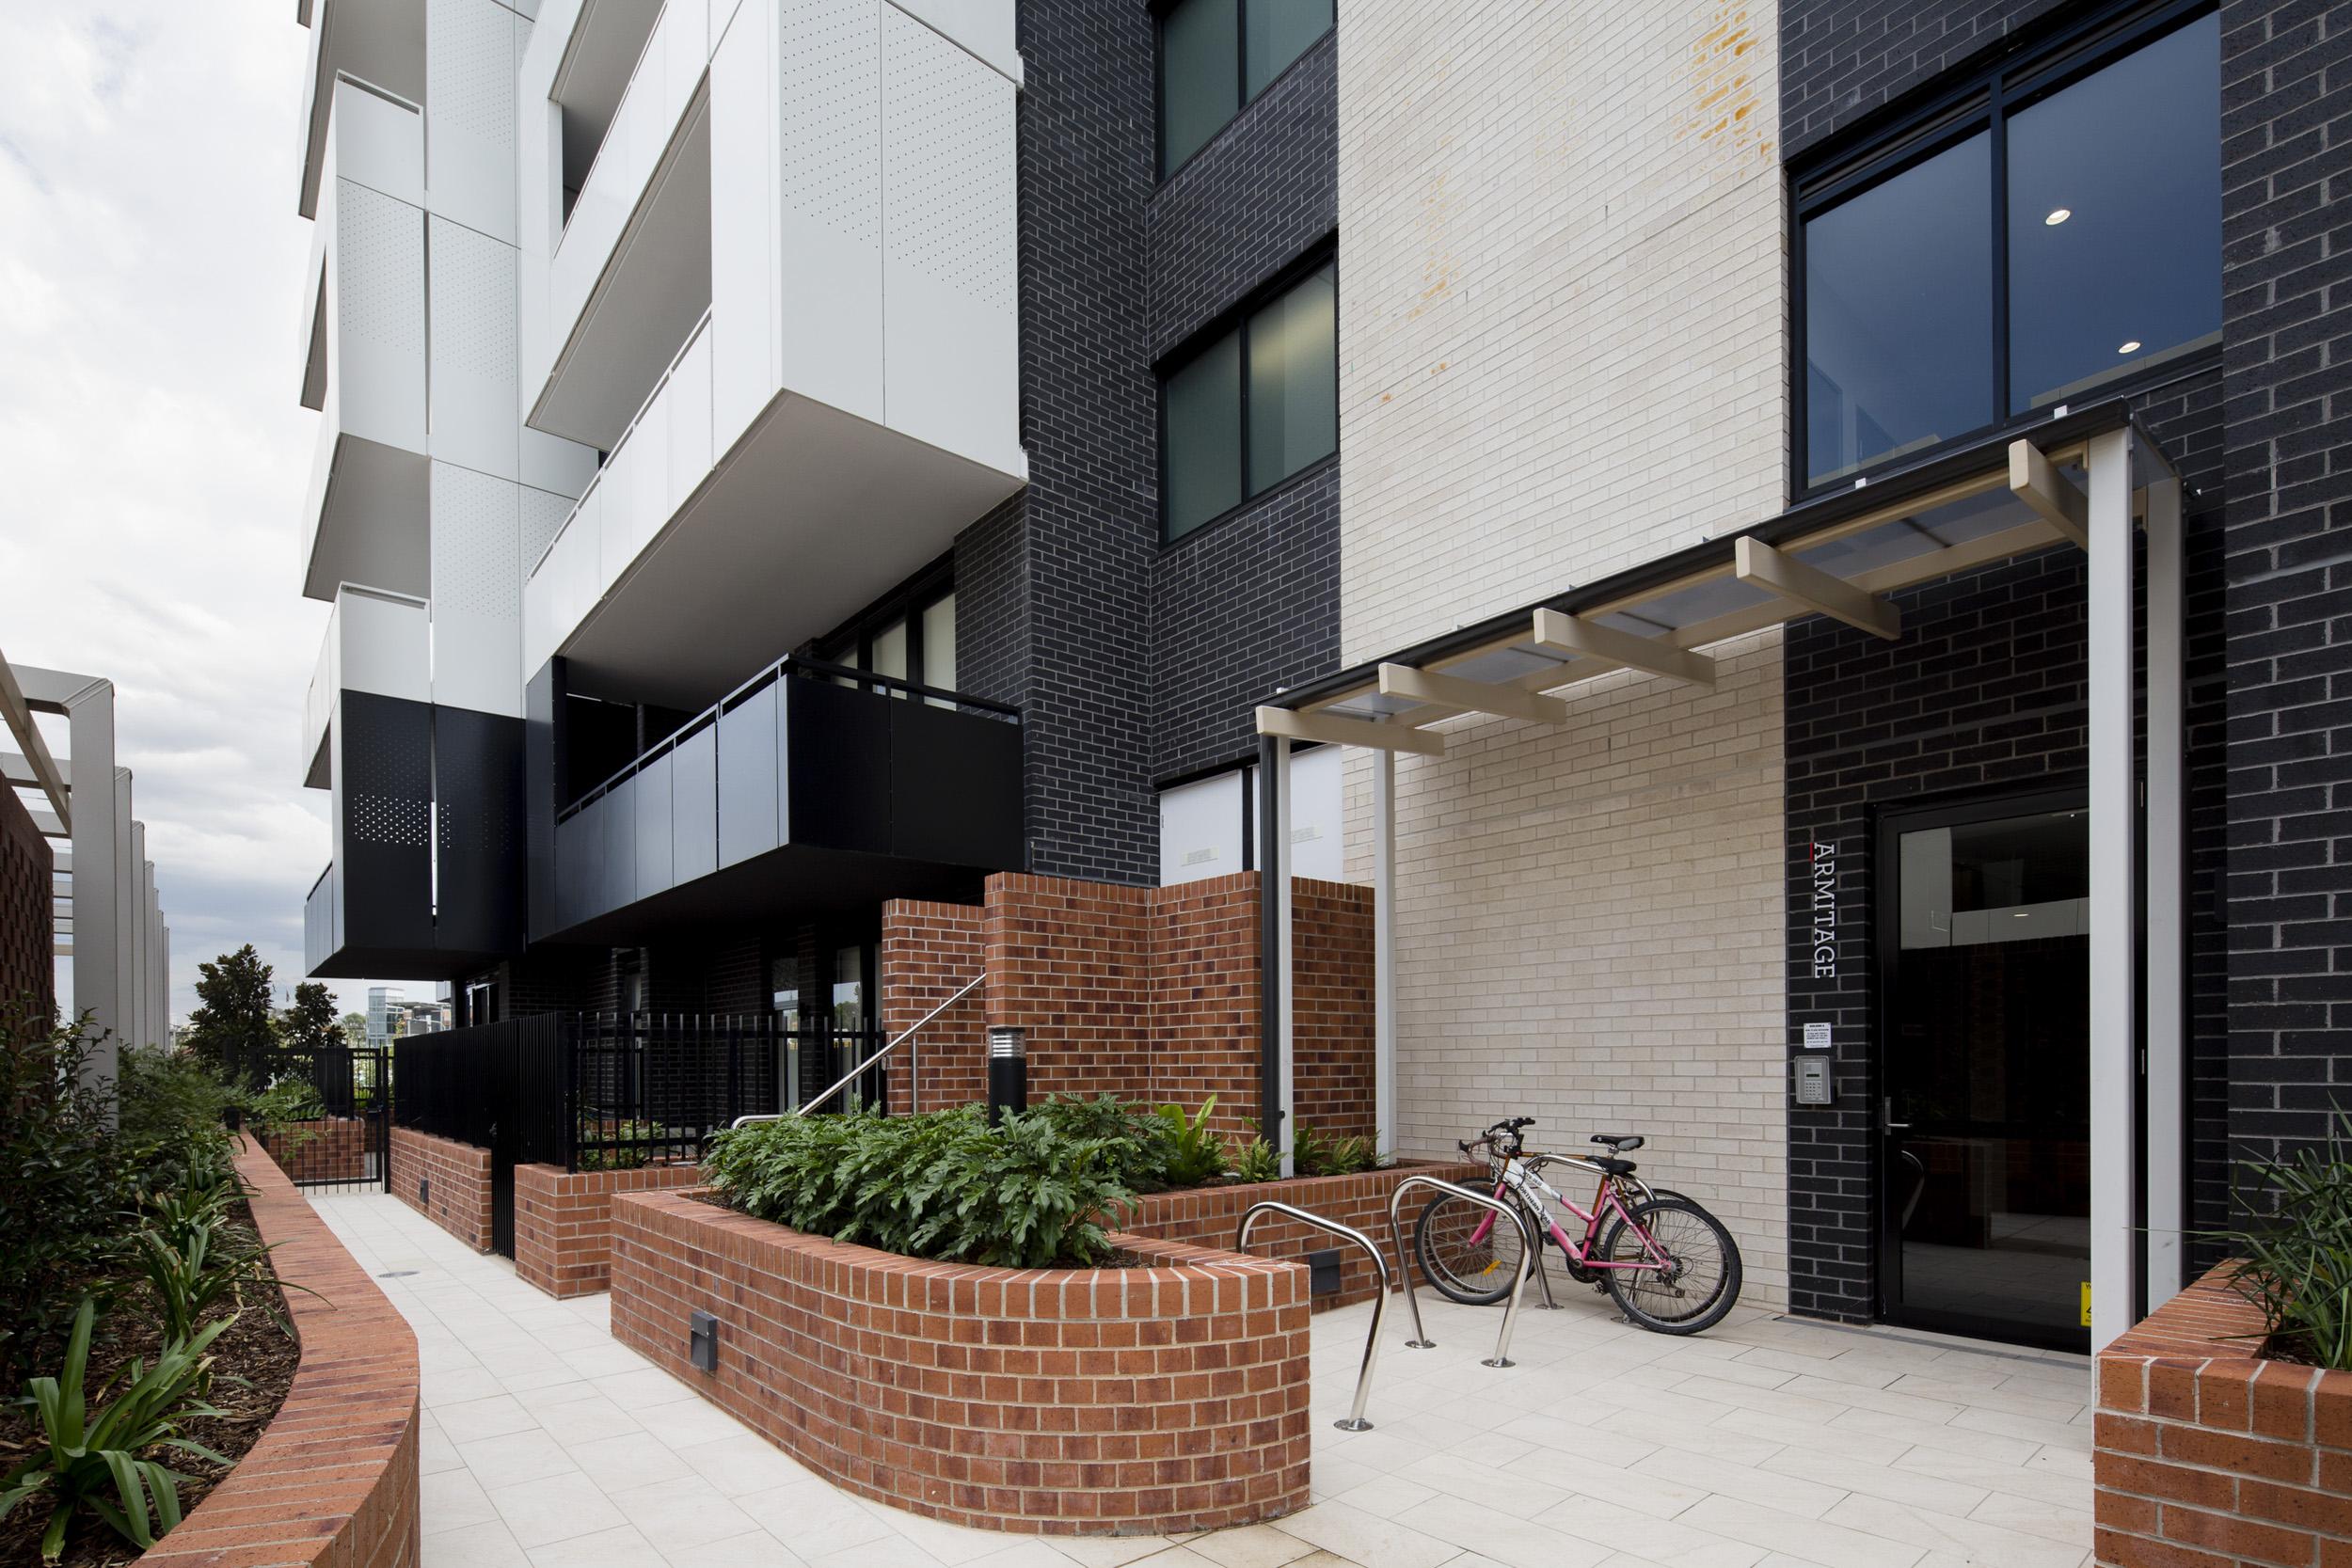 architecture_photography_sydney_australia_34.jpg